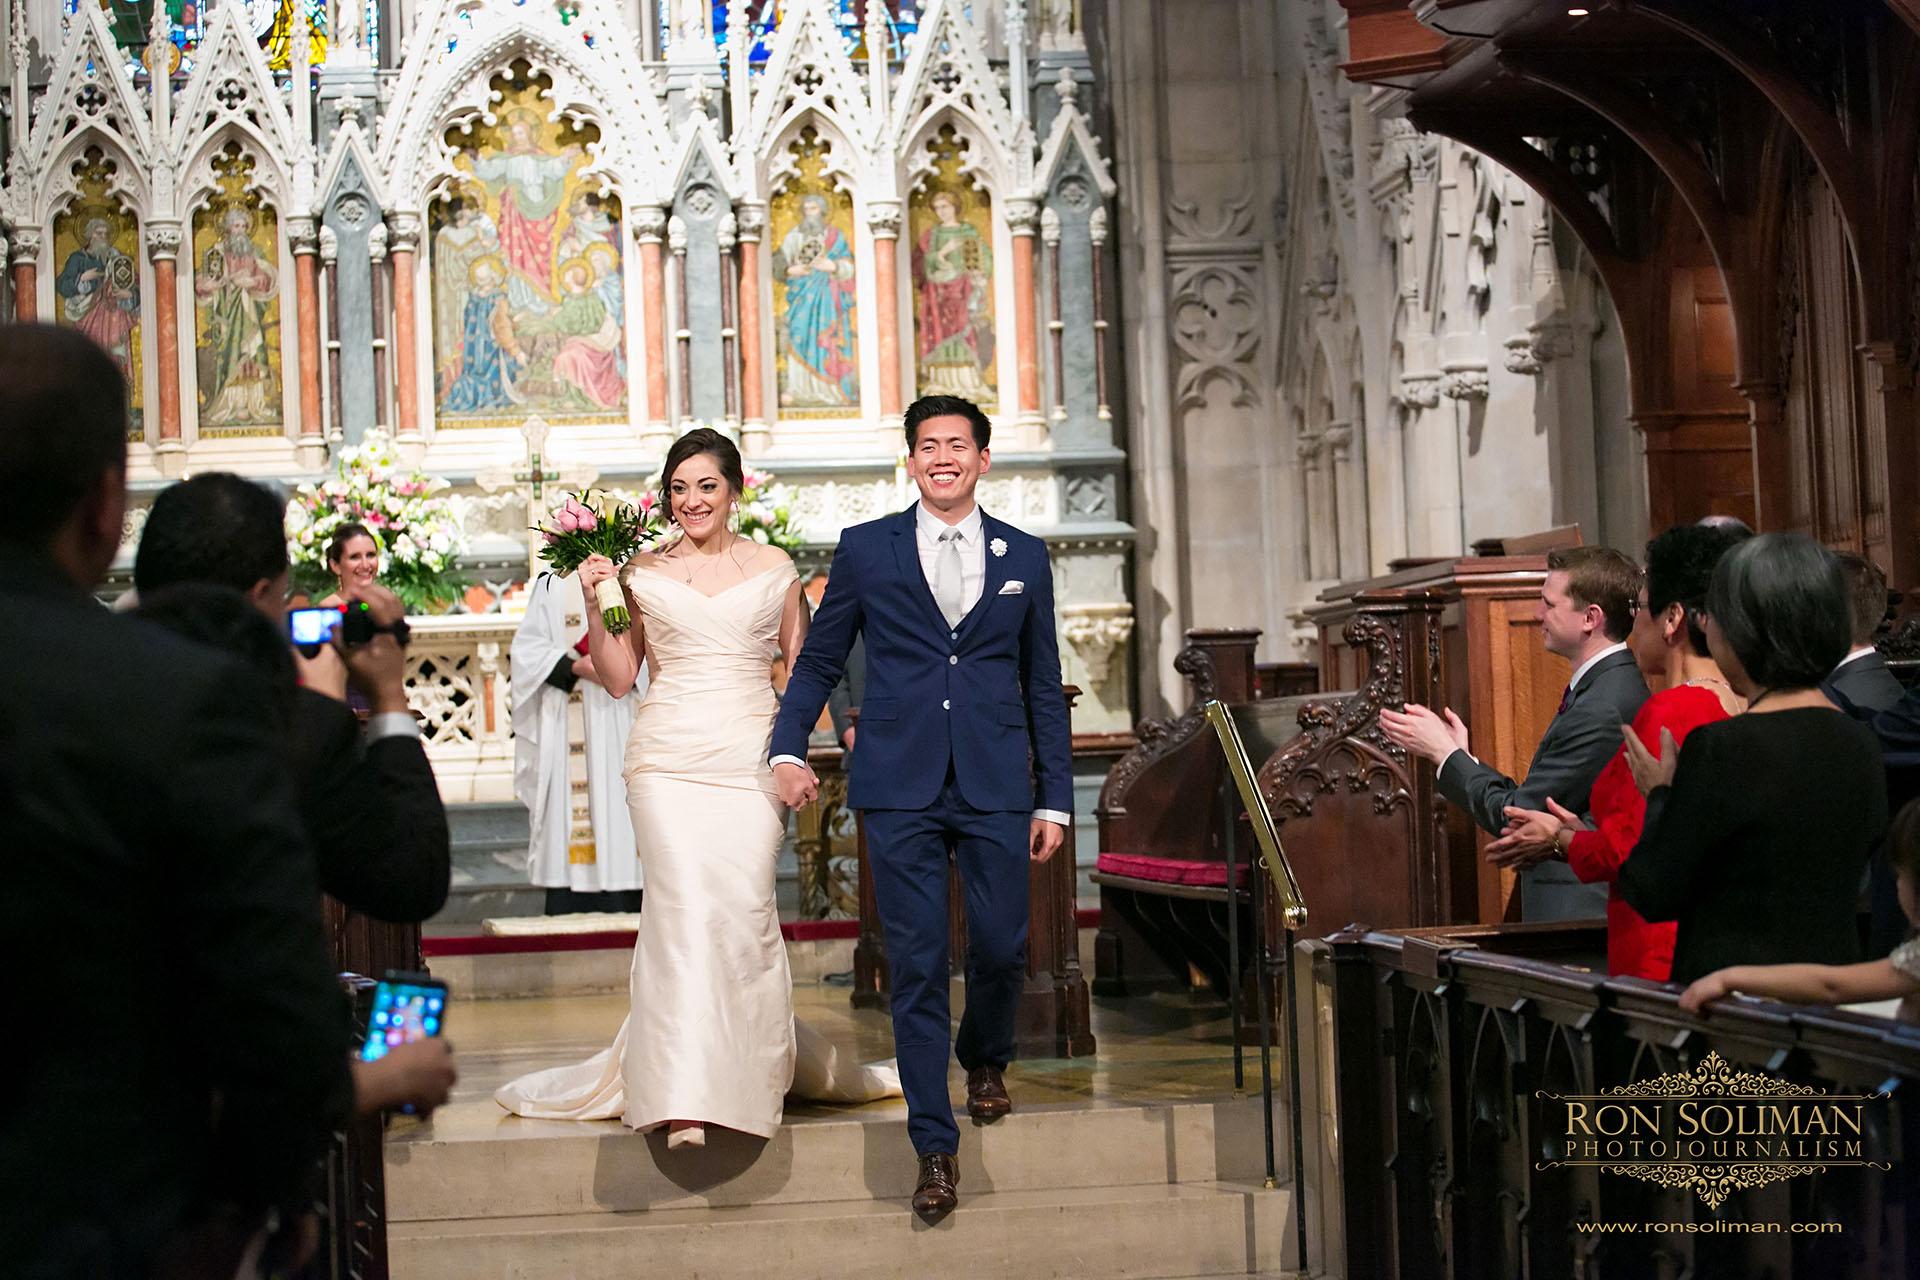 LIGHTHOUSE CHELSEA PIERS WEDDING 16